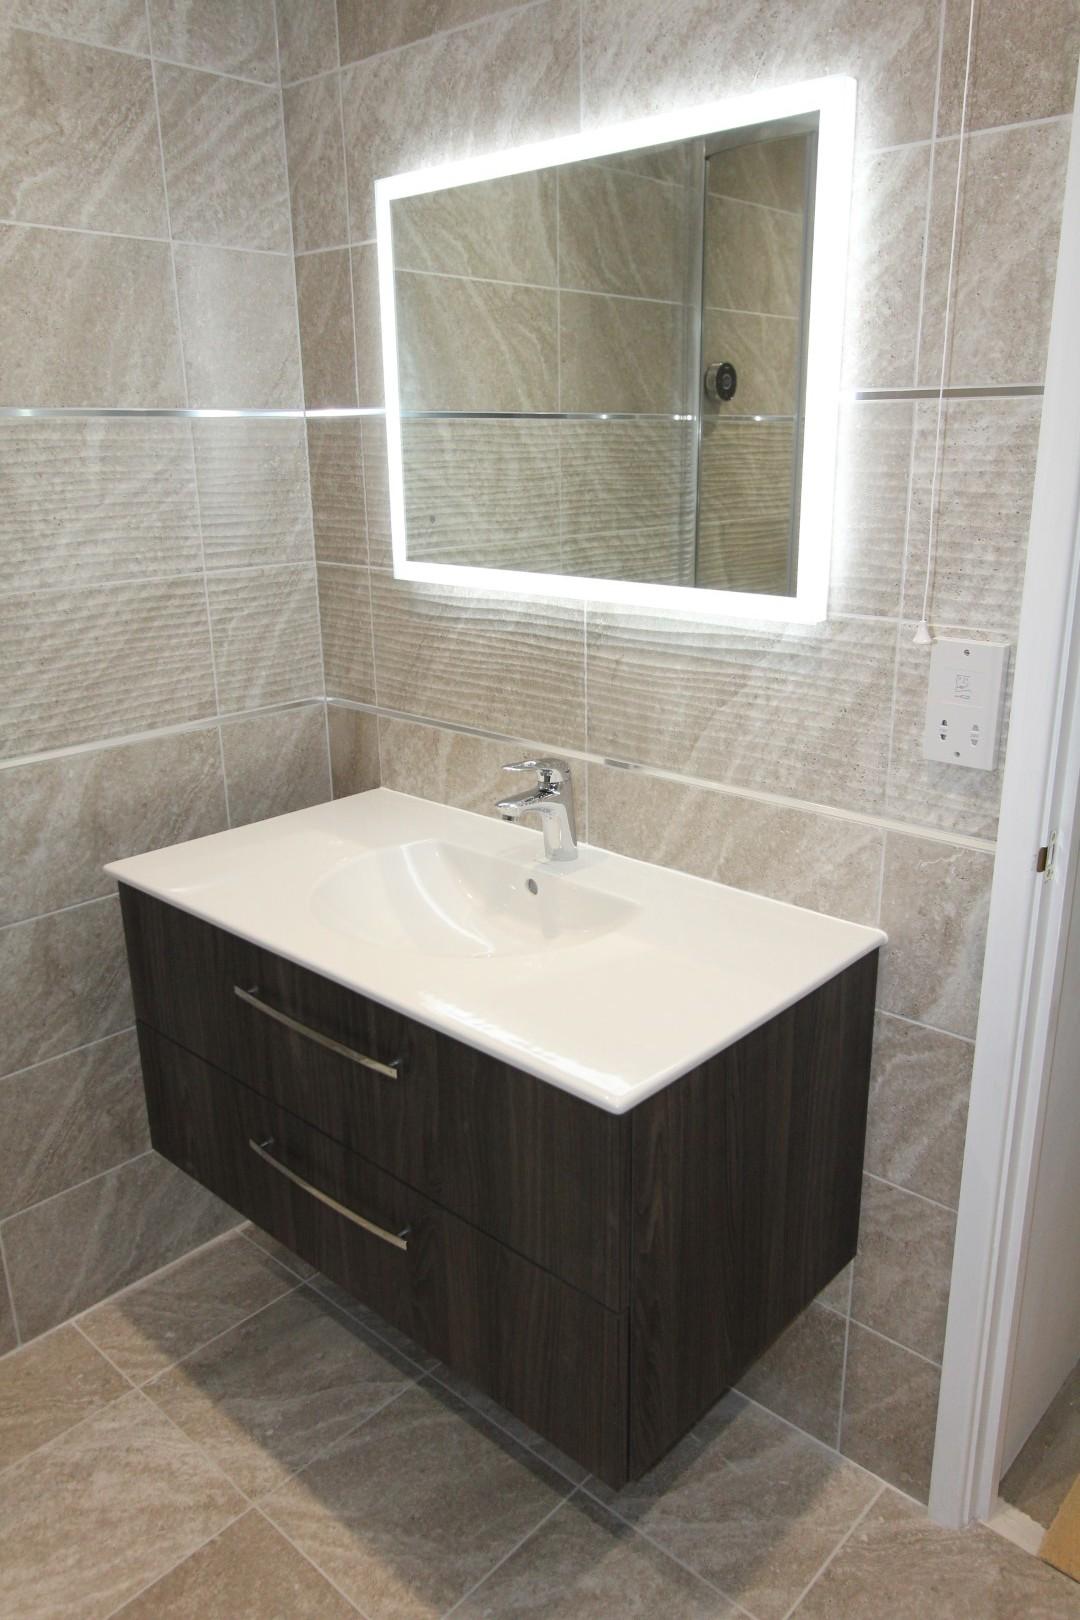 Dack Atlantic Bathrooms & Kitchens (5).jpeg